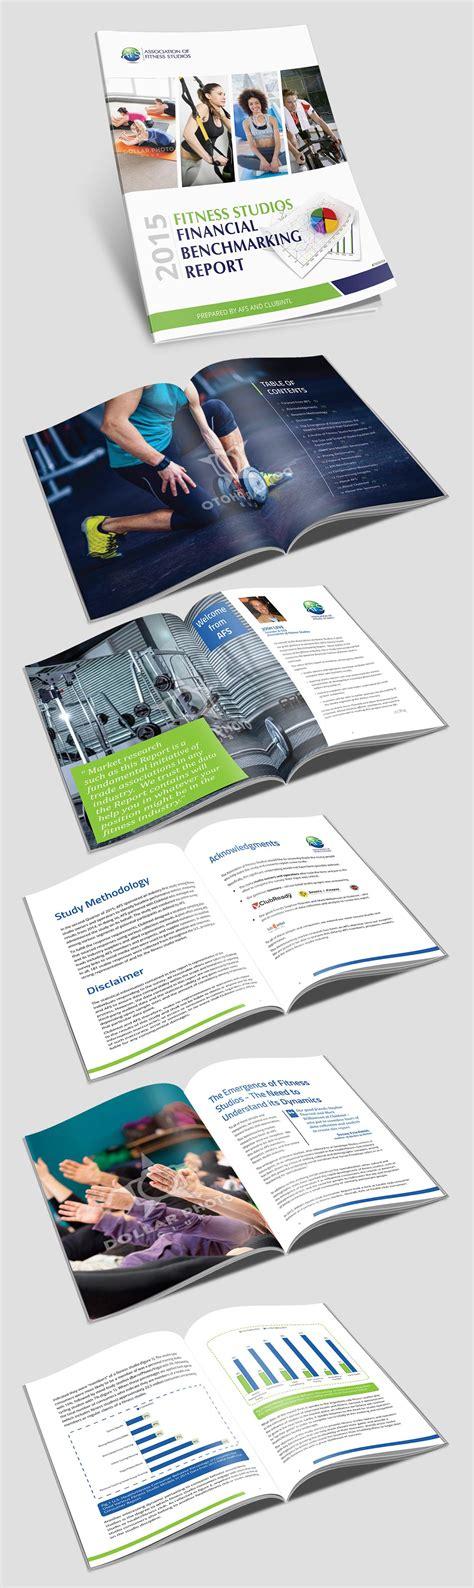 book interior layout design services book ebook and business report interior layout design by